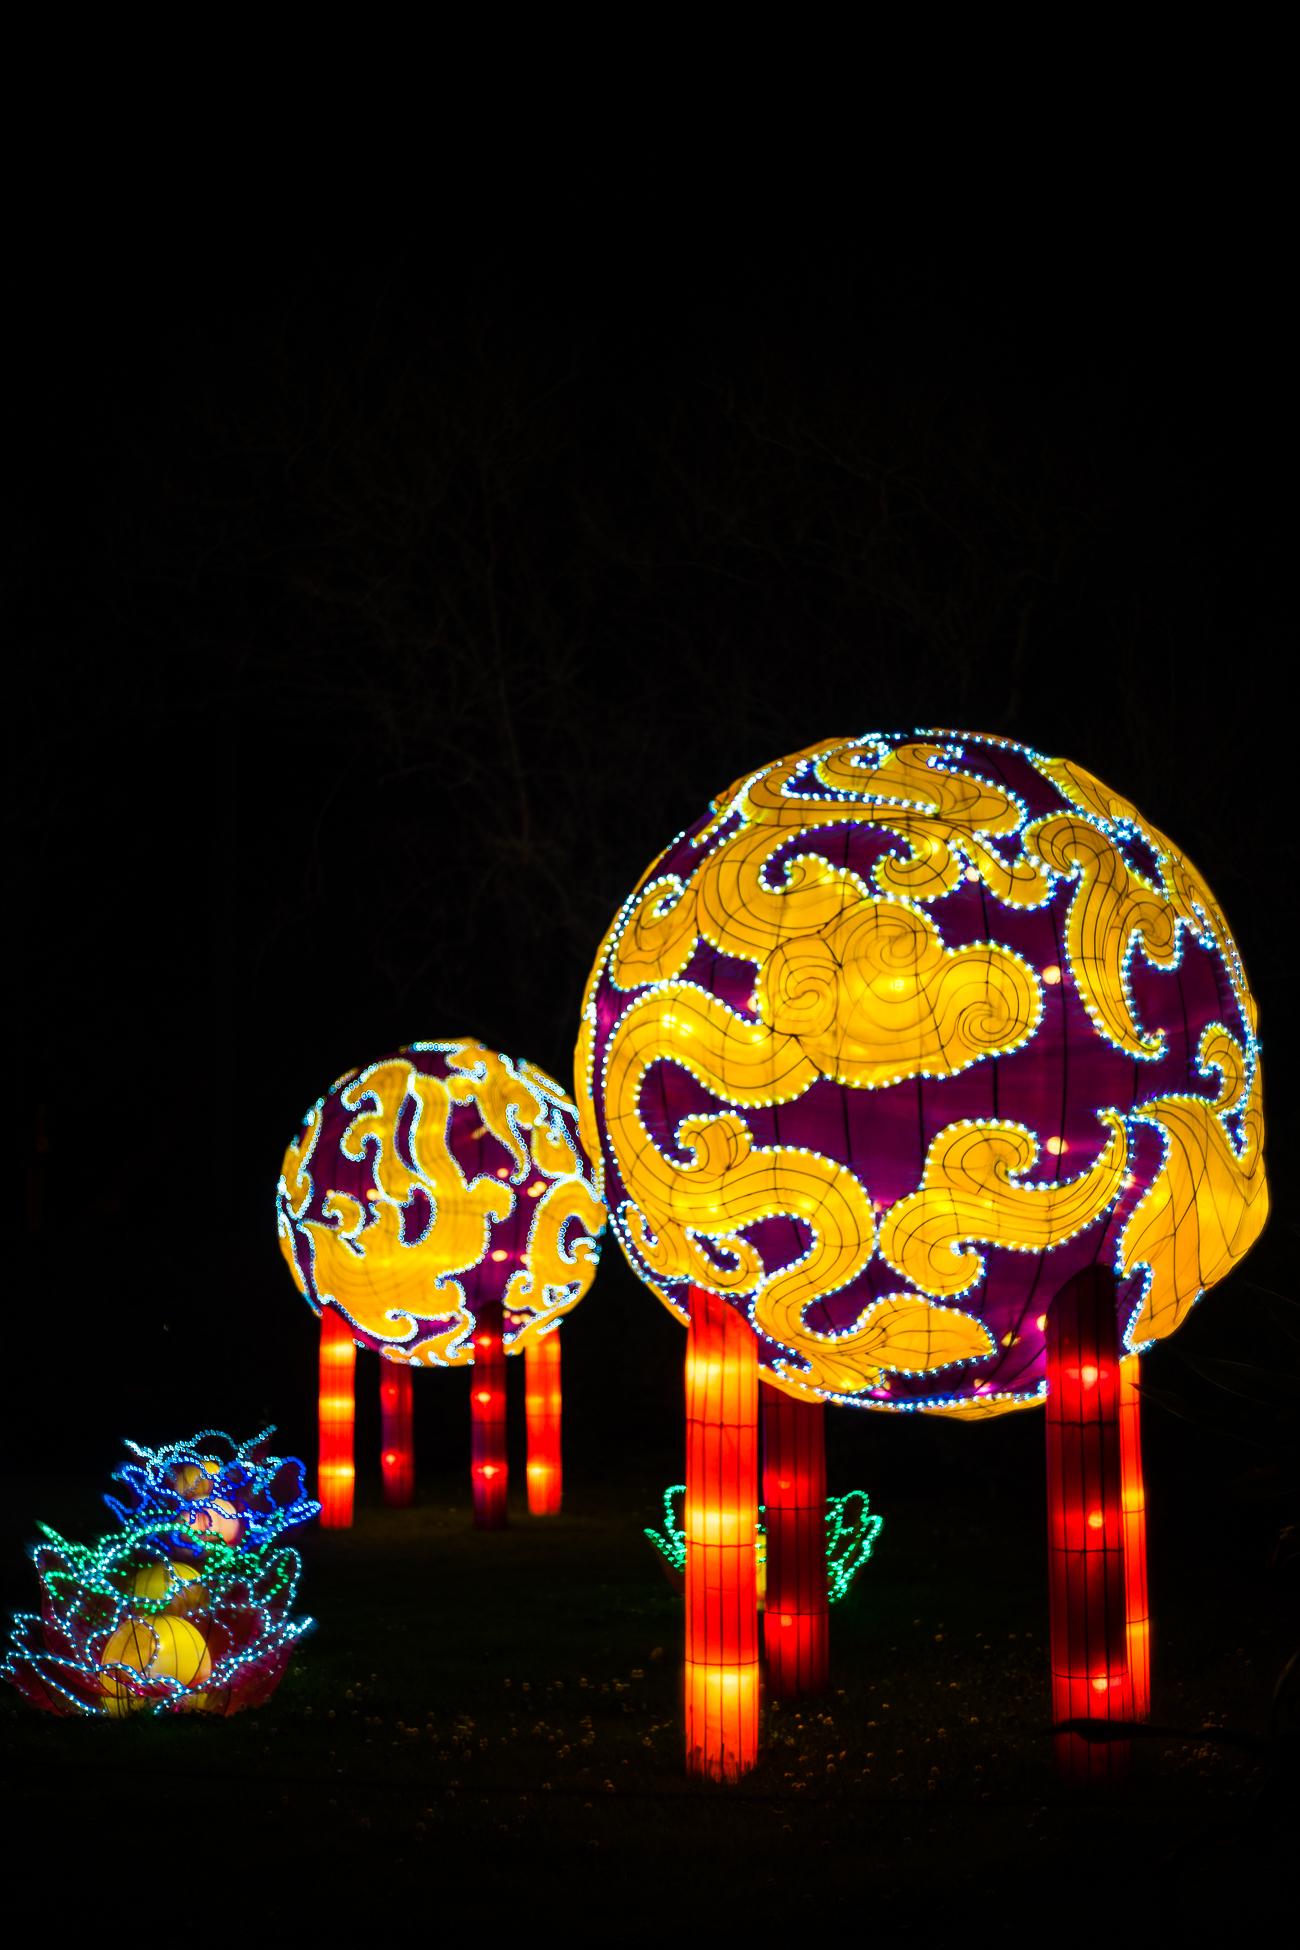 china_lights-141.jpg